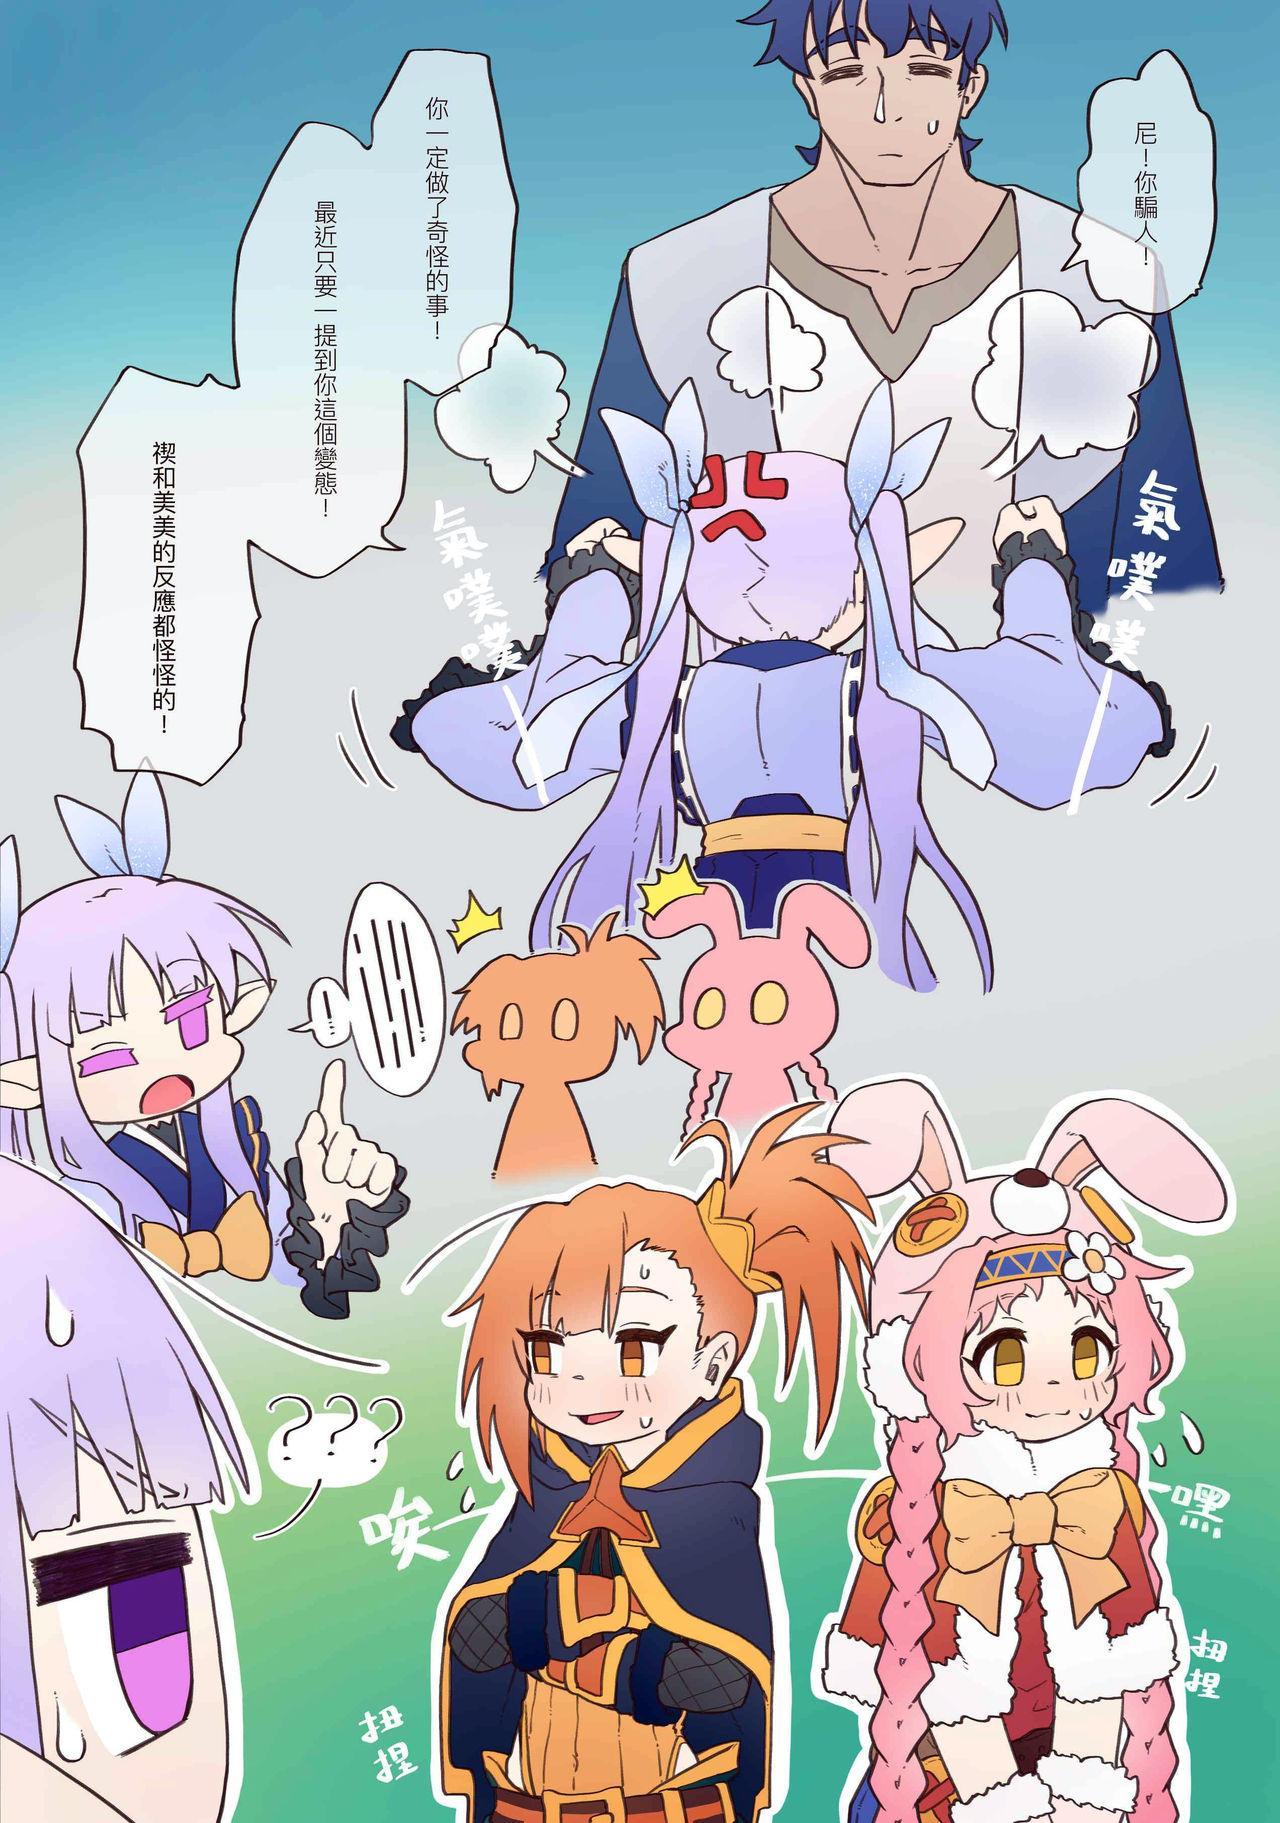 [MountainHan(山含)] Little Lyrical 002 (Princess Connect! Re:Dive) [Chinese] [切嚕系女子個人搬運] [Decensored] +小宣傳 20